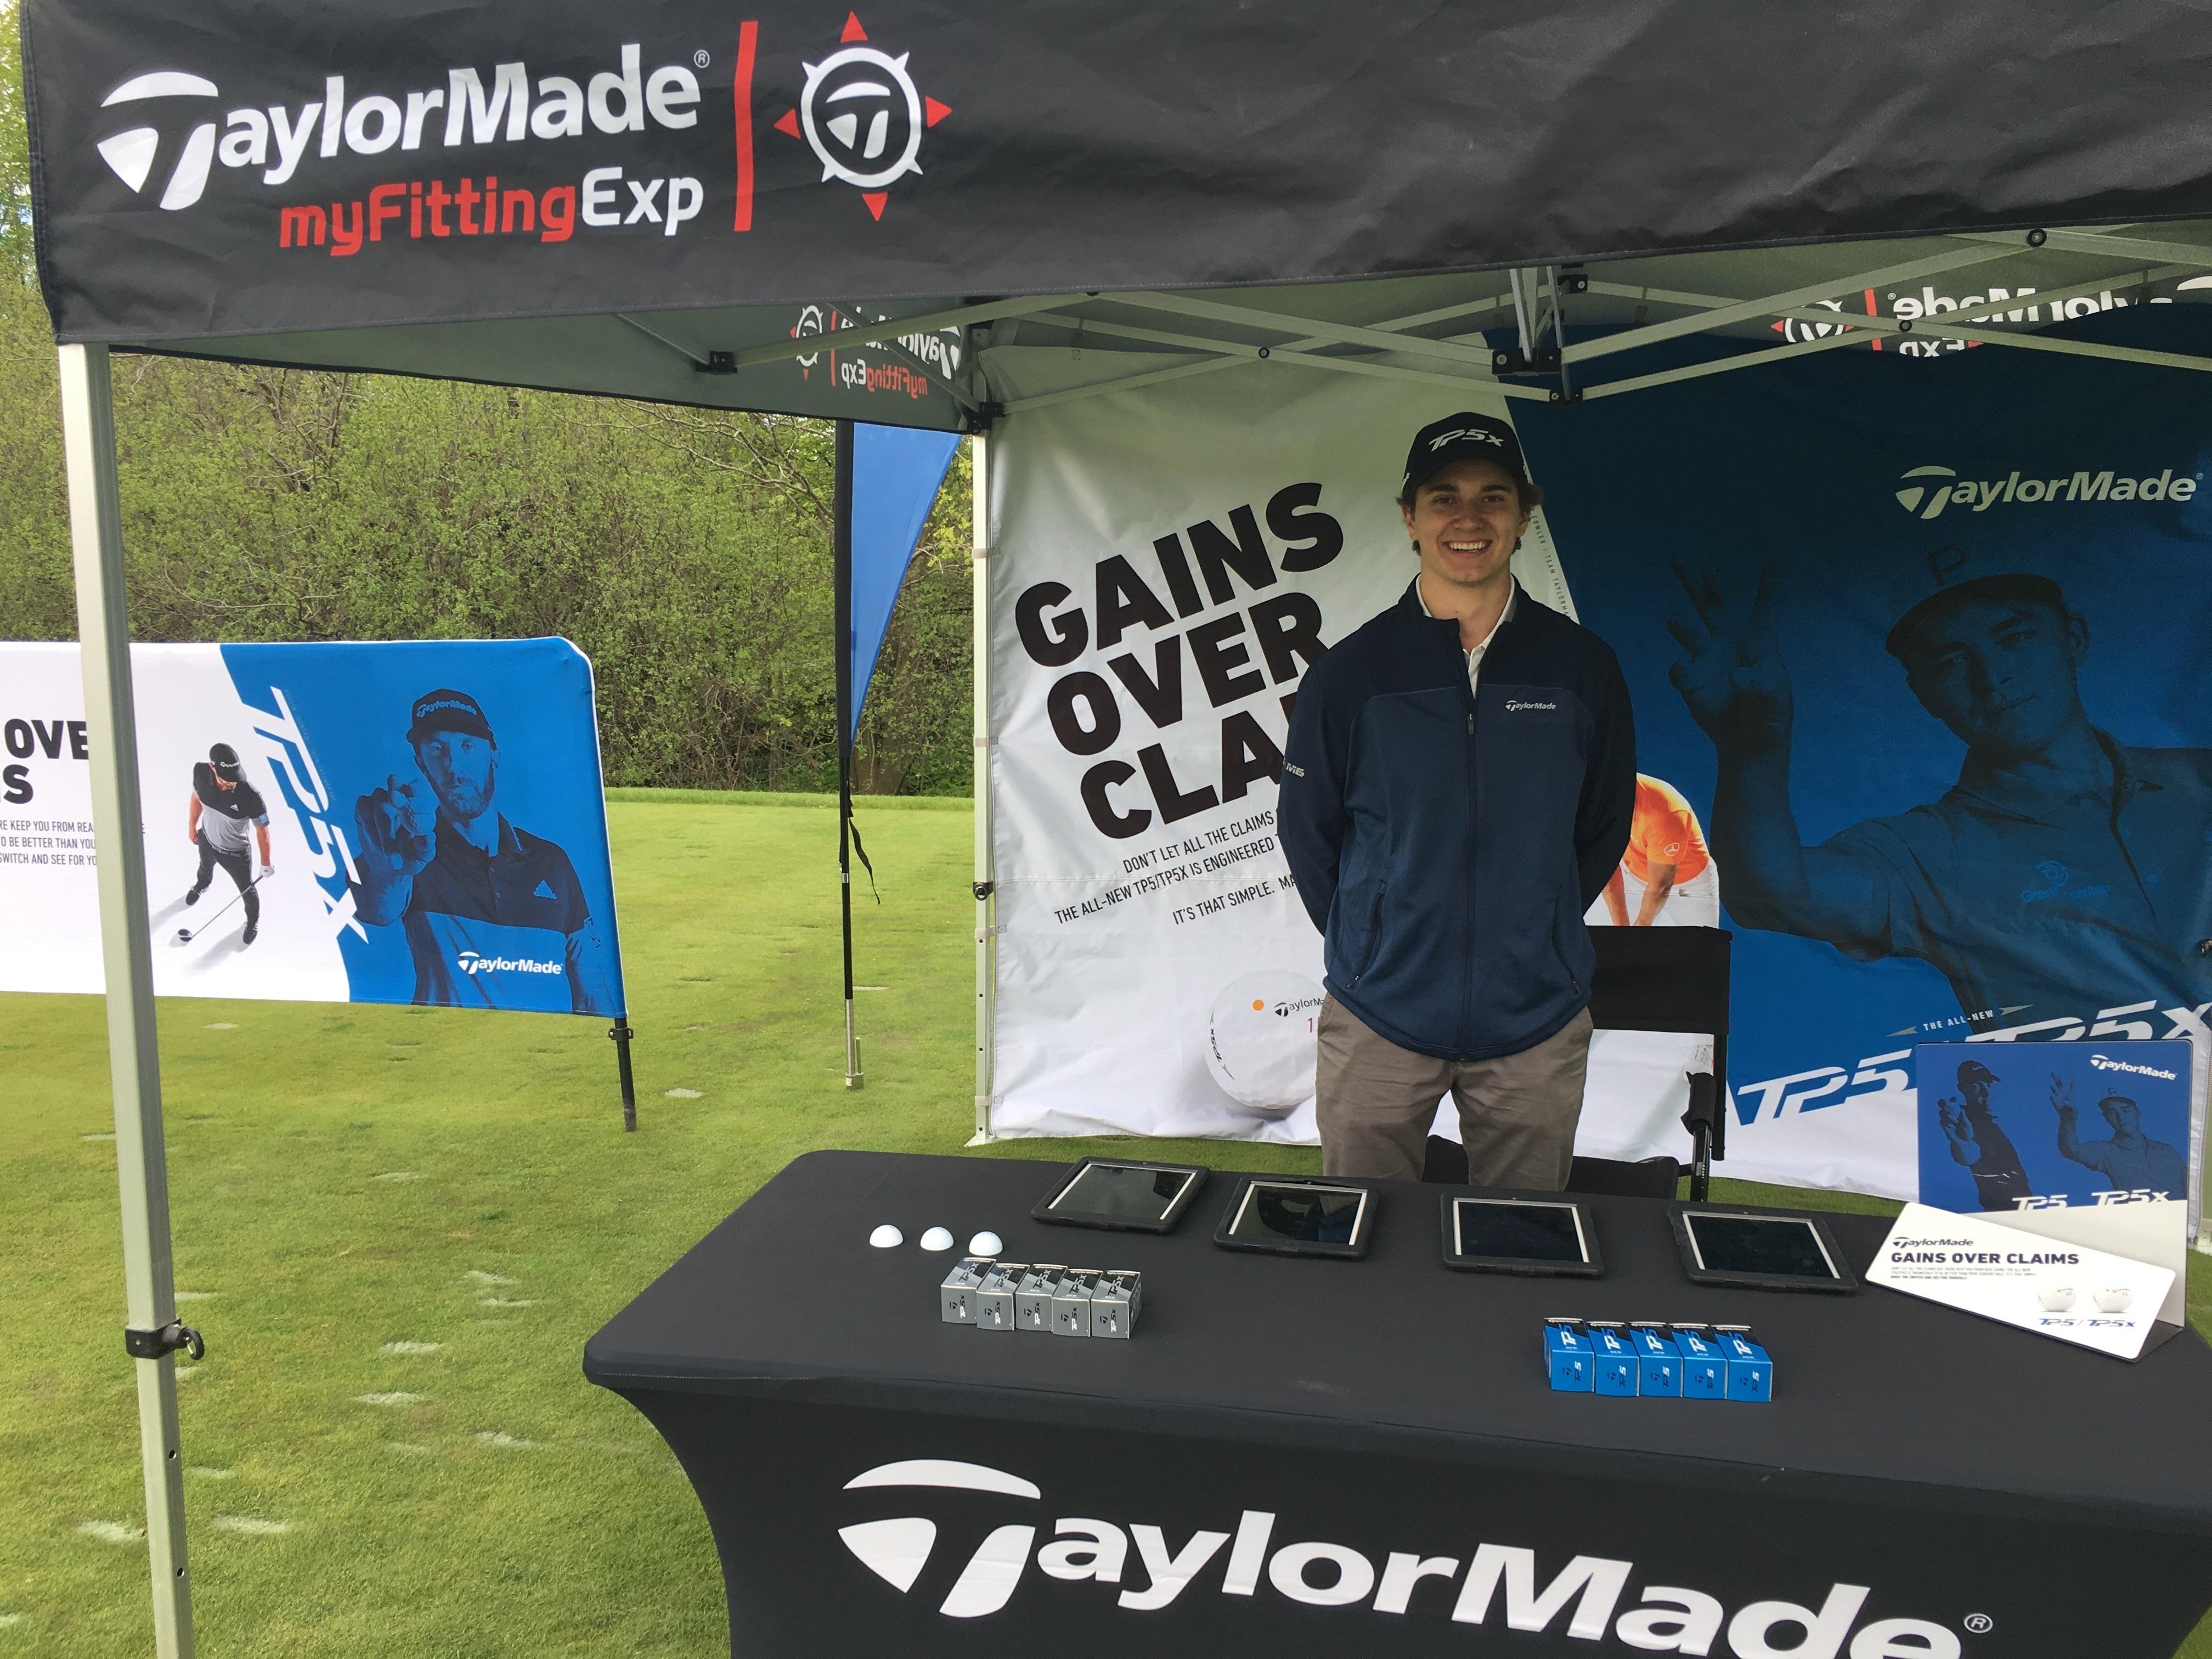 CJGA (Canadian Junior Golf Association) Charity Golf Tournament on Sept 17 gallery image #10